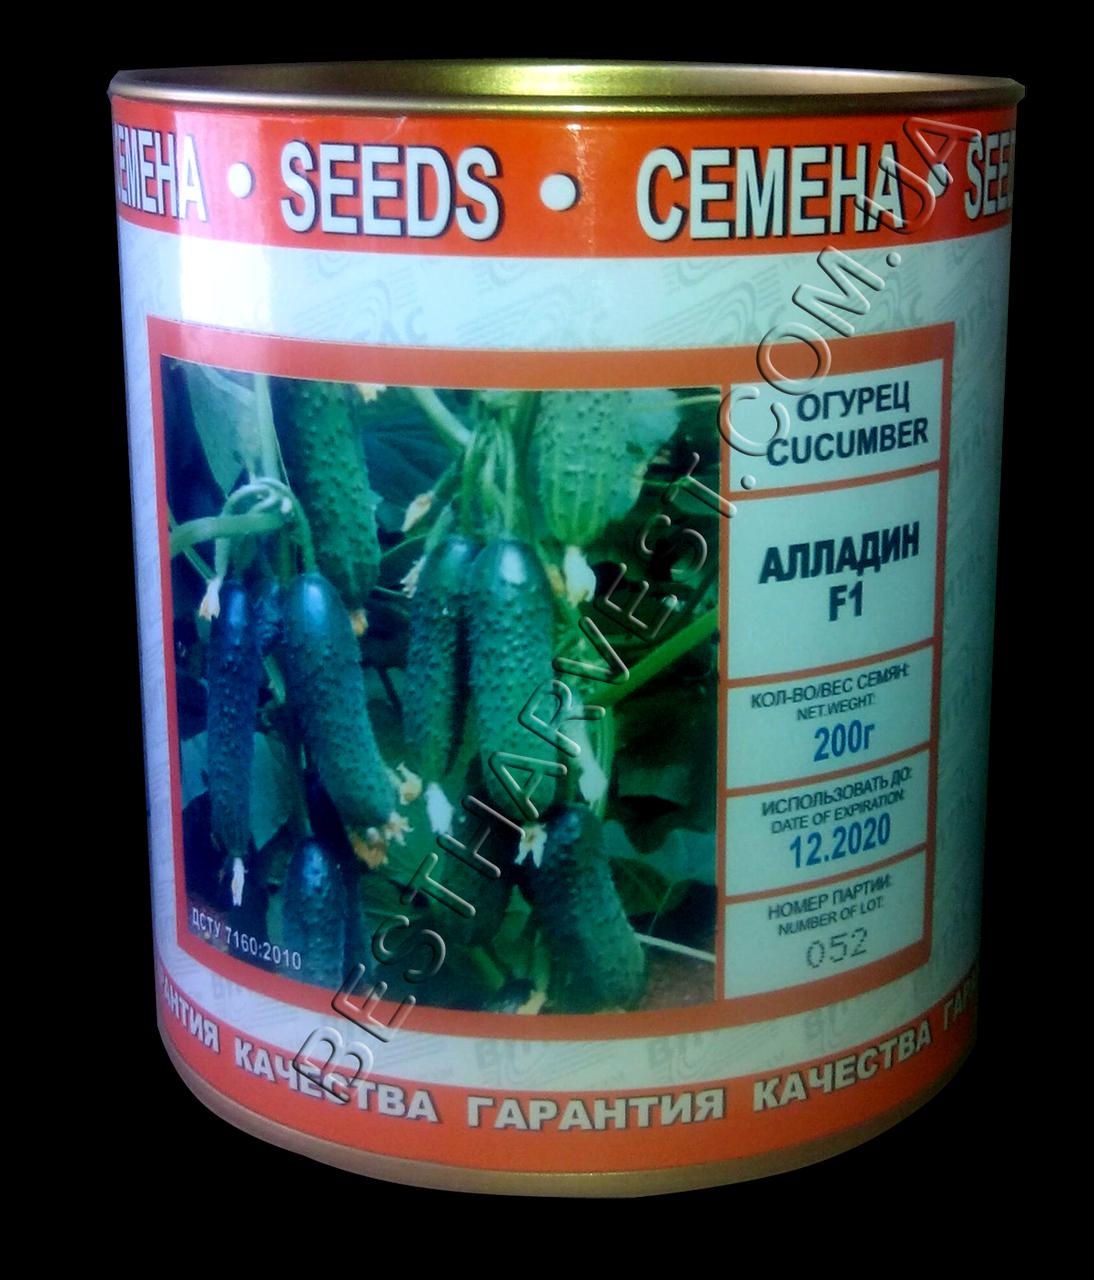 Семена огурца «Алладин F1» инкрустированные, 200 г